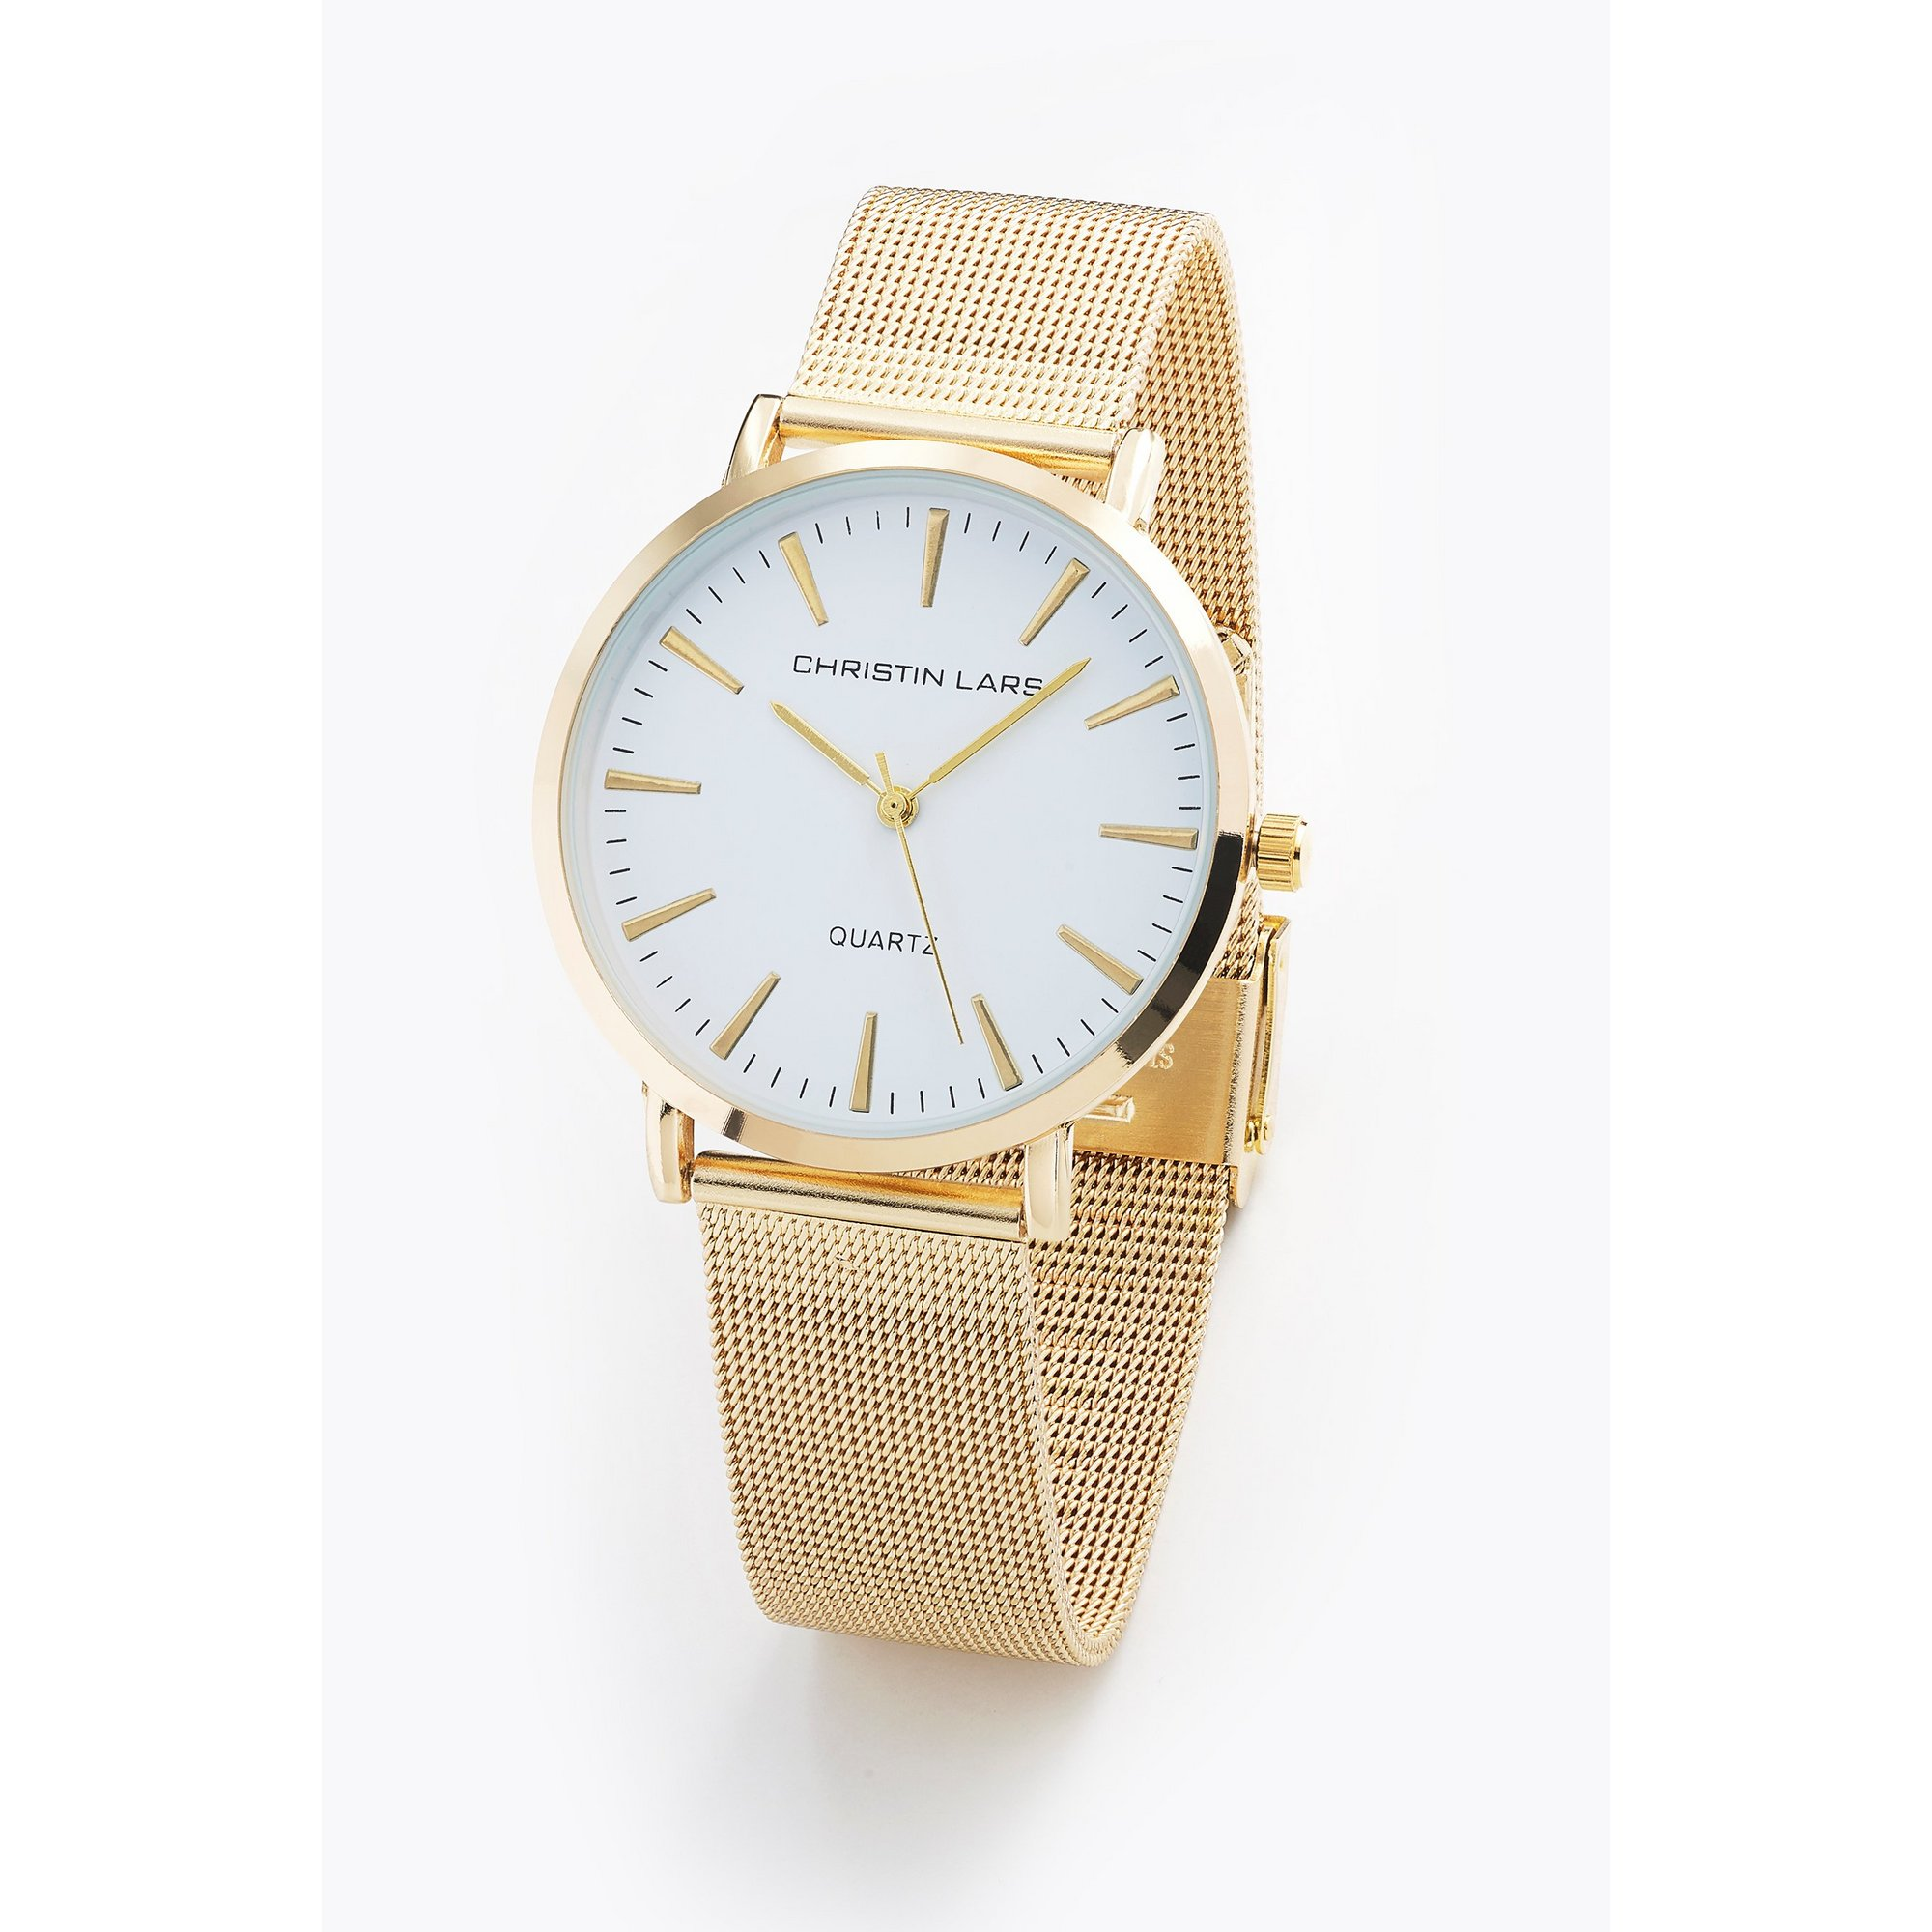 Image of Christin Lars Gents Gold Tone Bracelet Watch